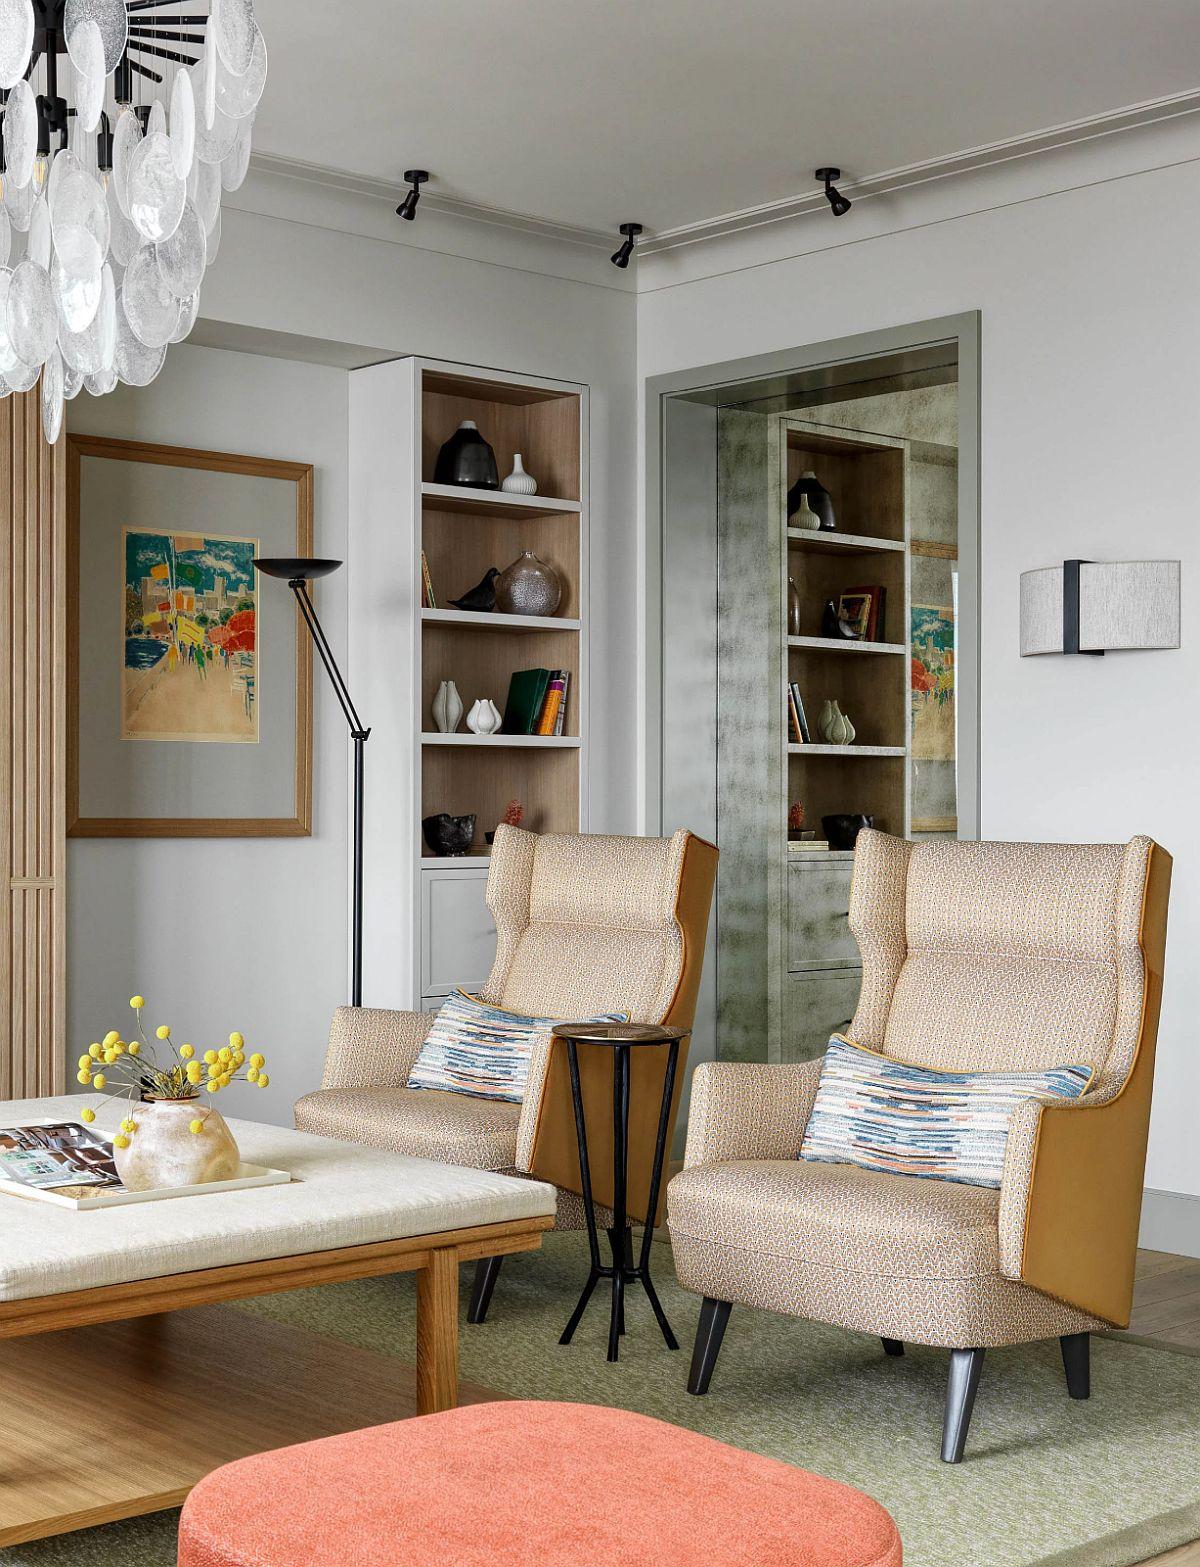 adelaparvu.com despre apartament 196 mp, designer Anna Pavlovskaya, Foto Serghei Krasyuk (3)